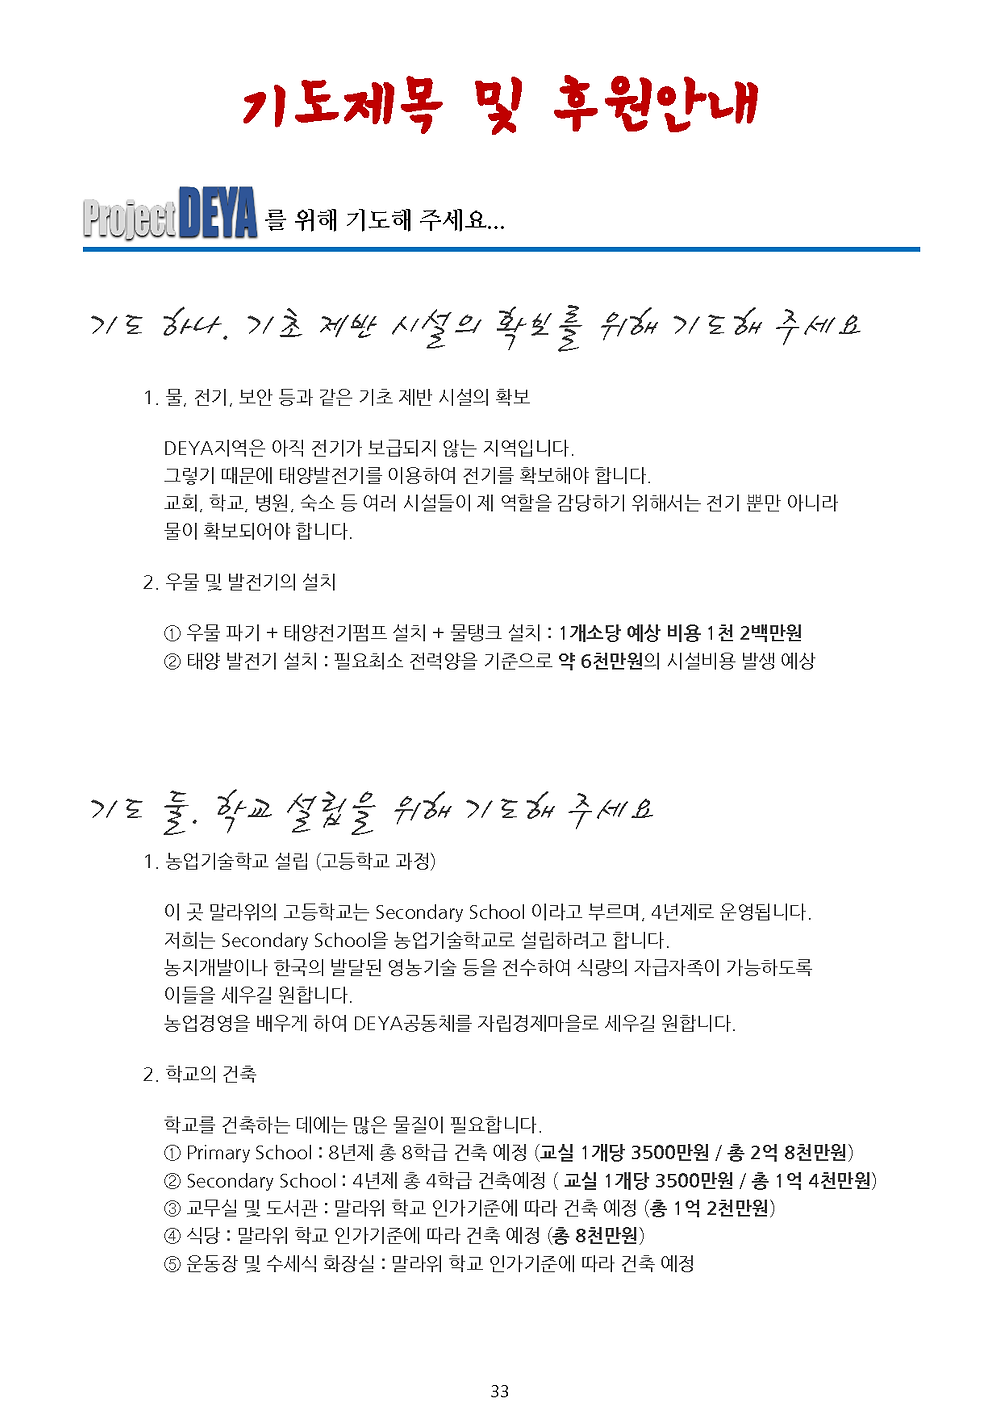 NWM 2014년 선교보고_33.png